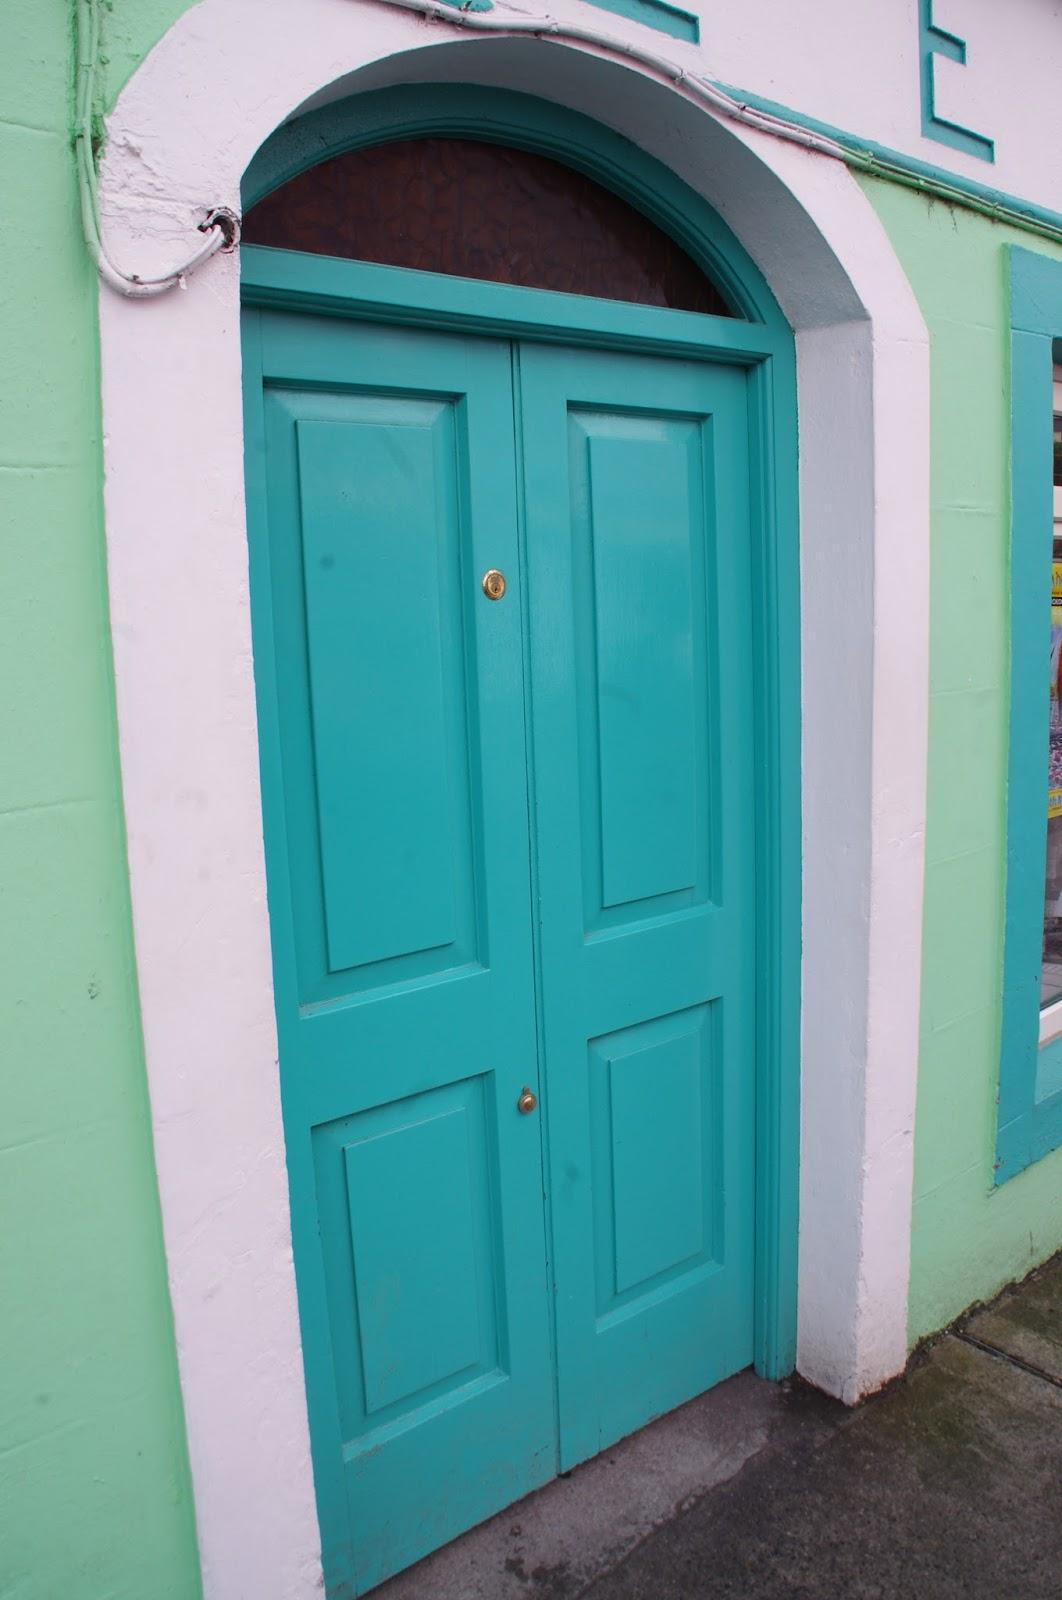 Bright blue door in Kinvarra Ireland